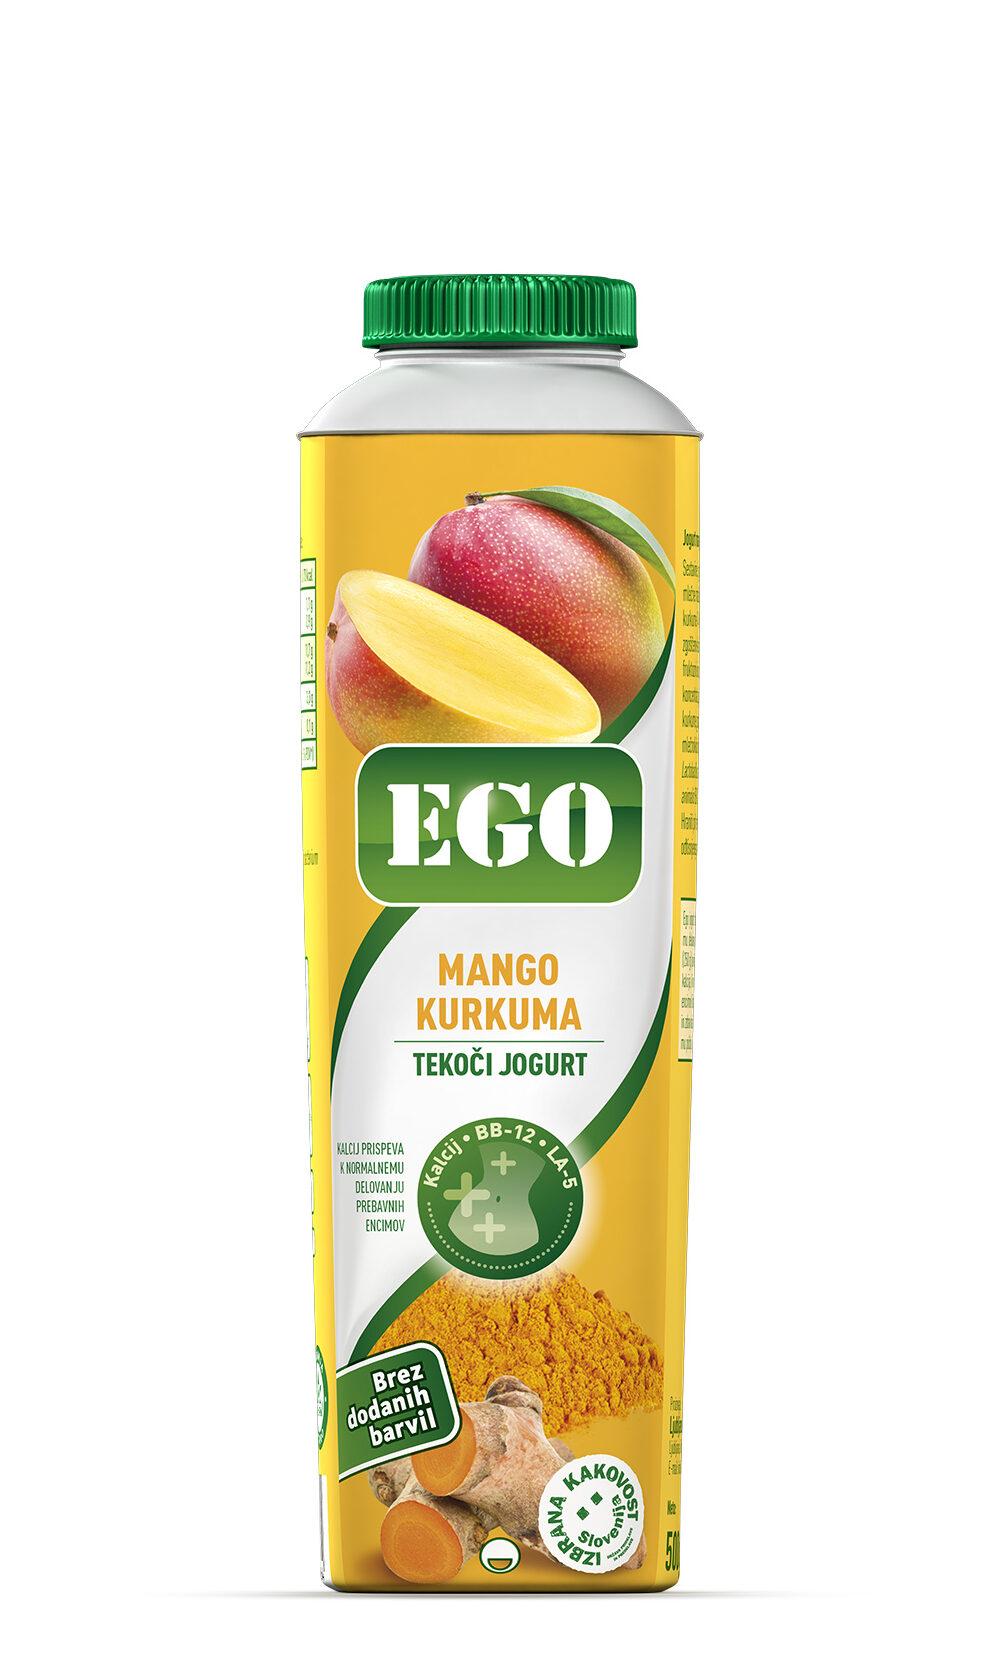 Ego, mango, kurkuma